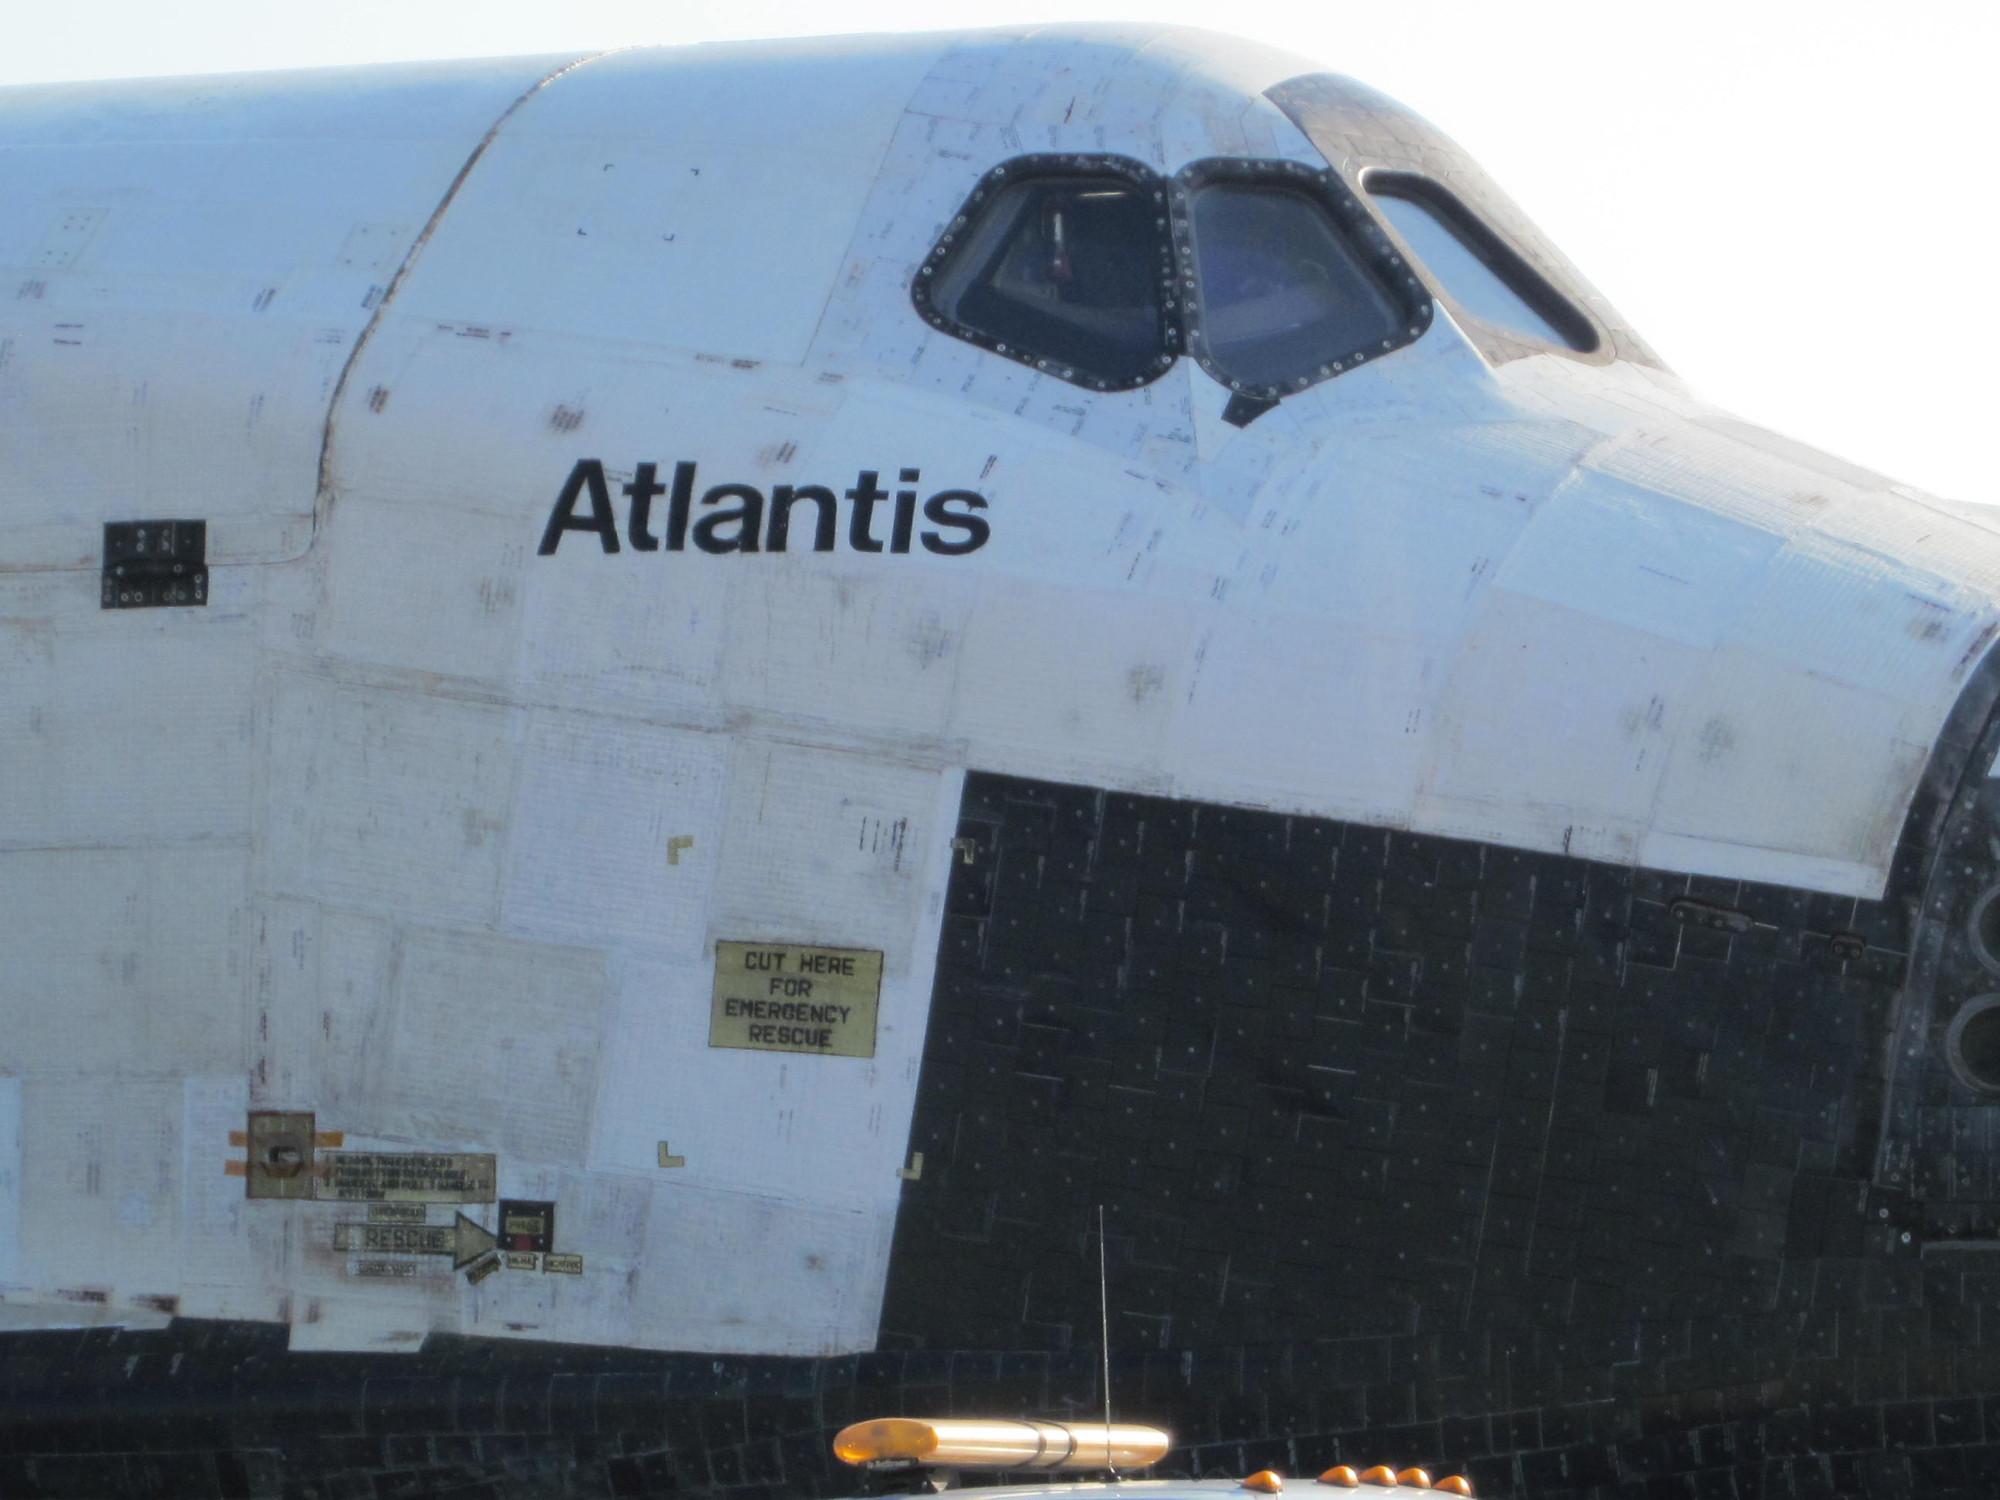 Atlantis' Forward Fuselage and Crew Cabin Detail